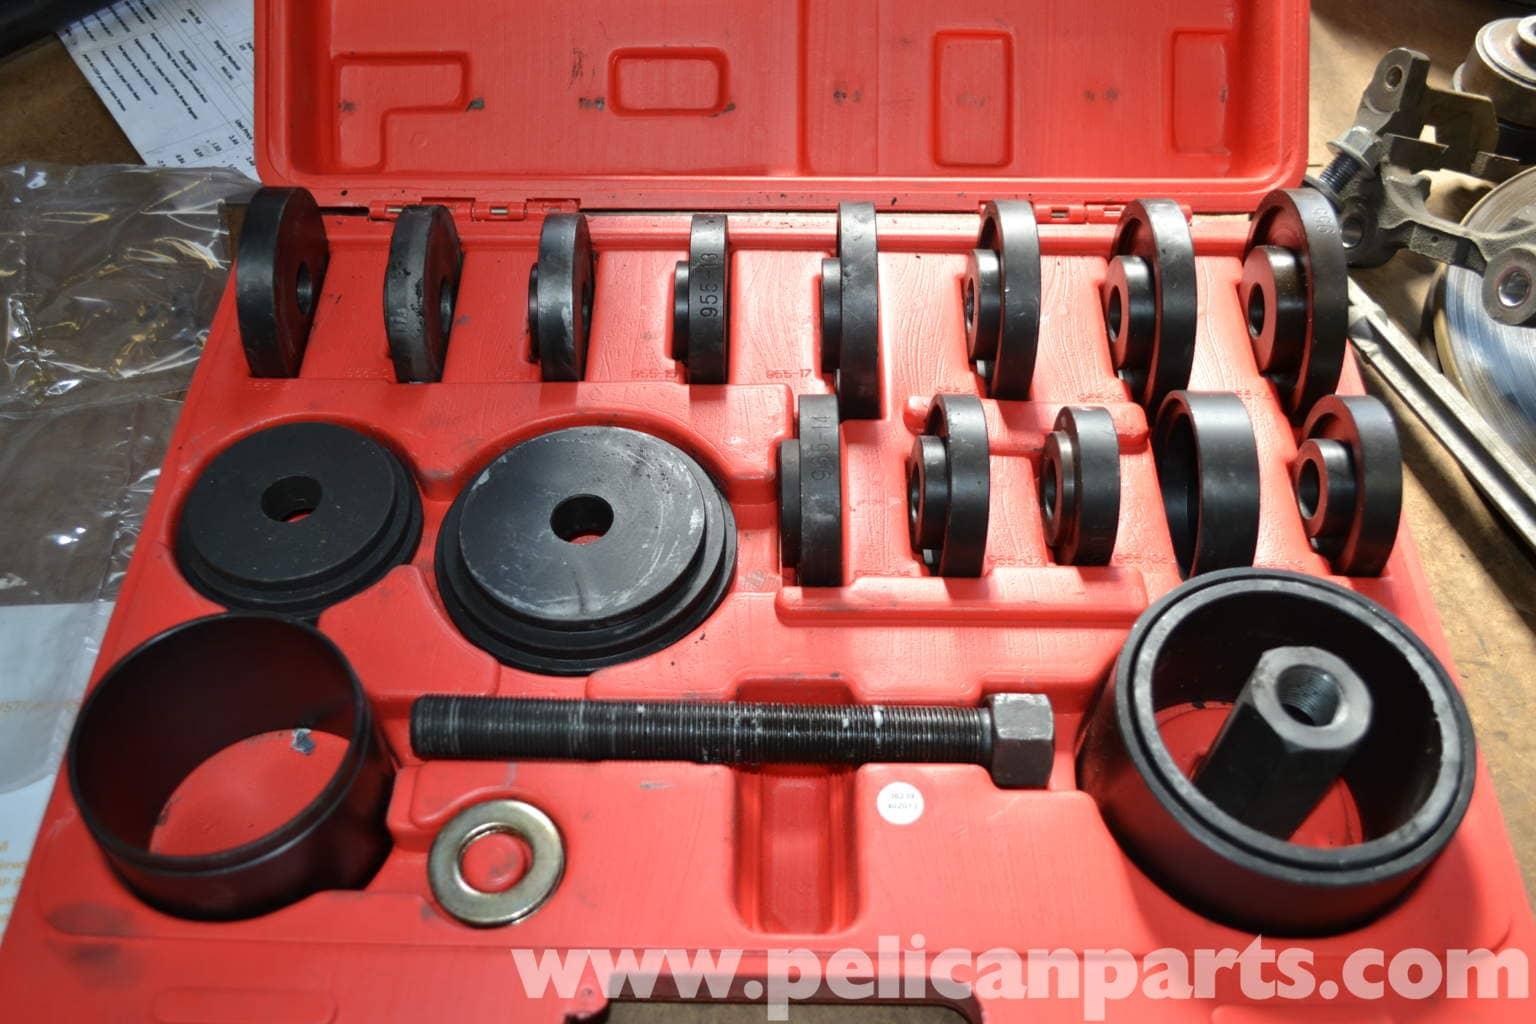 mercedes benz w204 torque strut and bearing replacement 2003 mercedes benz wiring diagram mercedes benz wiring #9